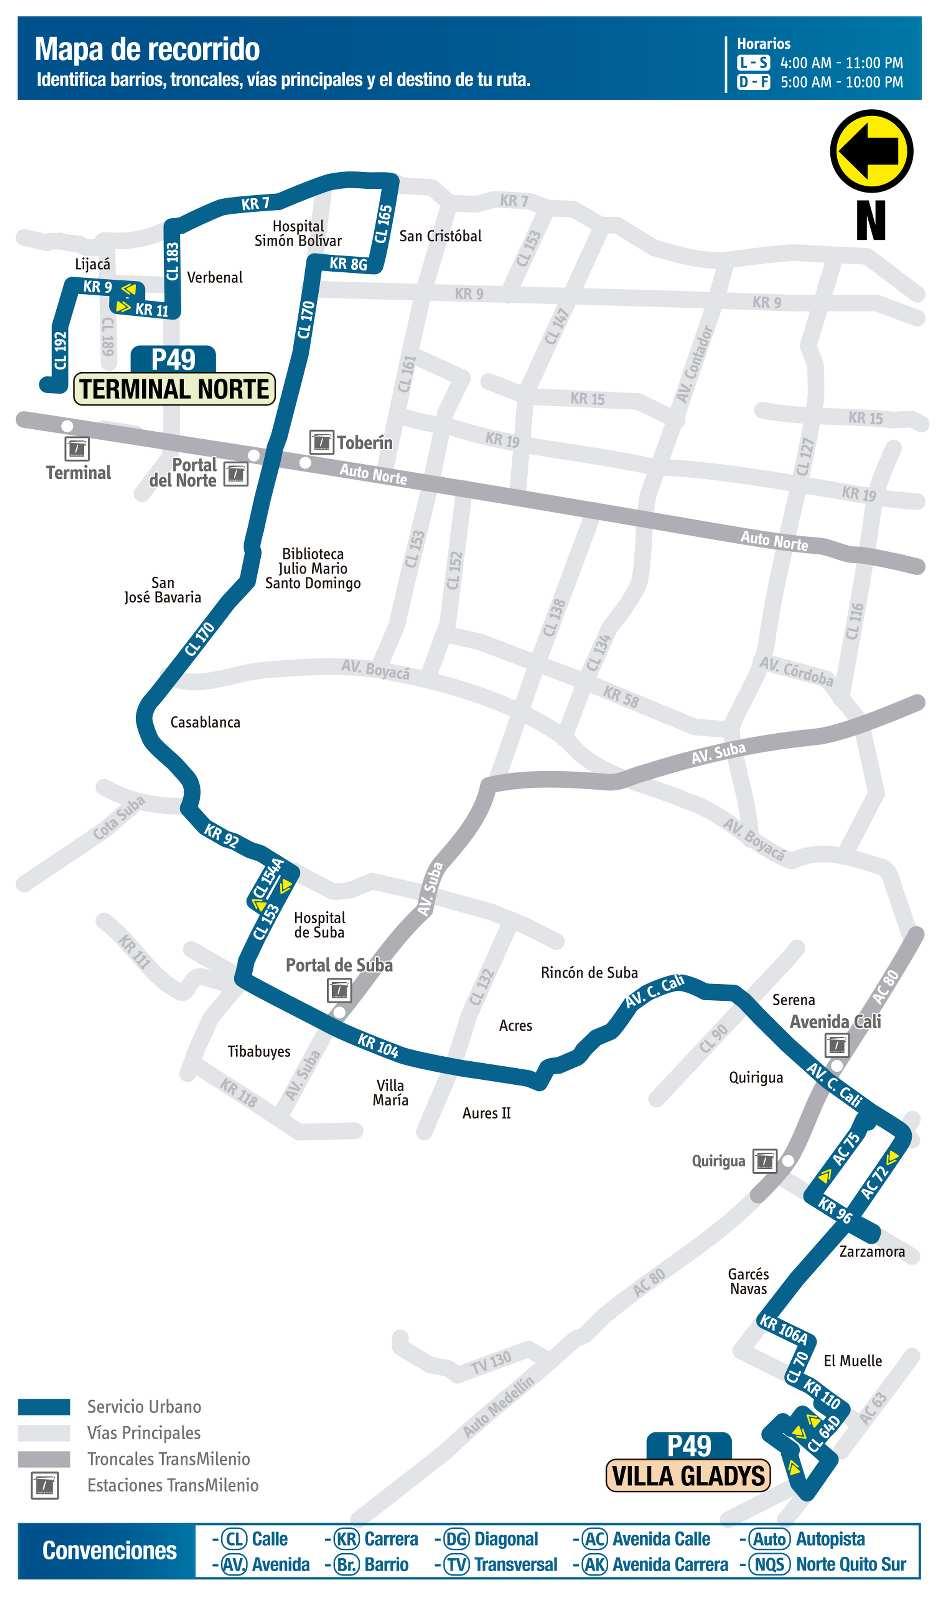 Ruta SITP: P49 Terminal Norte ↔ Villa Gladys (mapa)